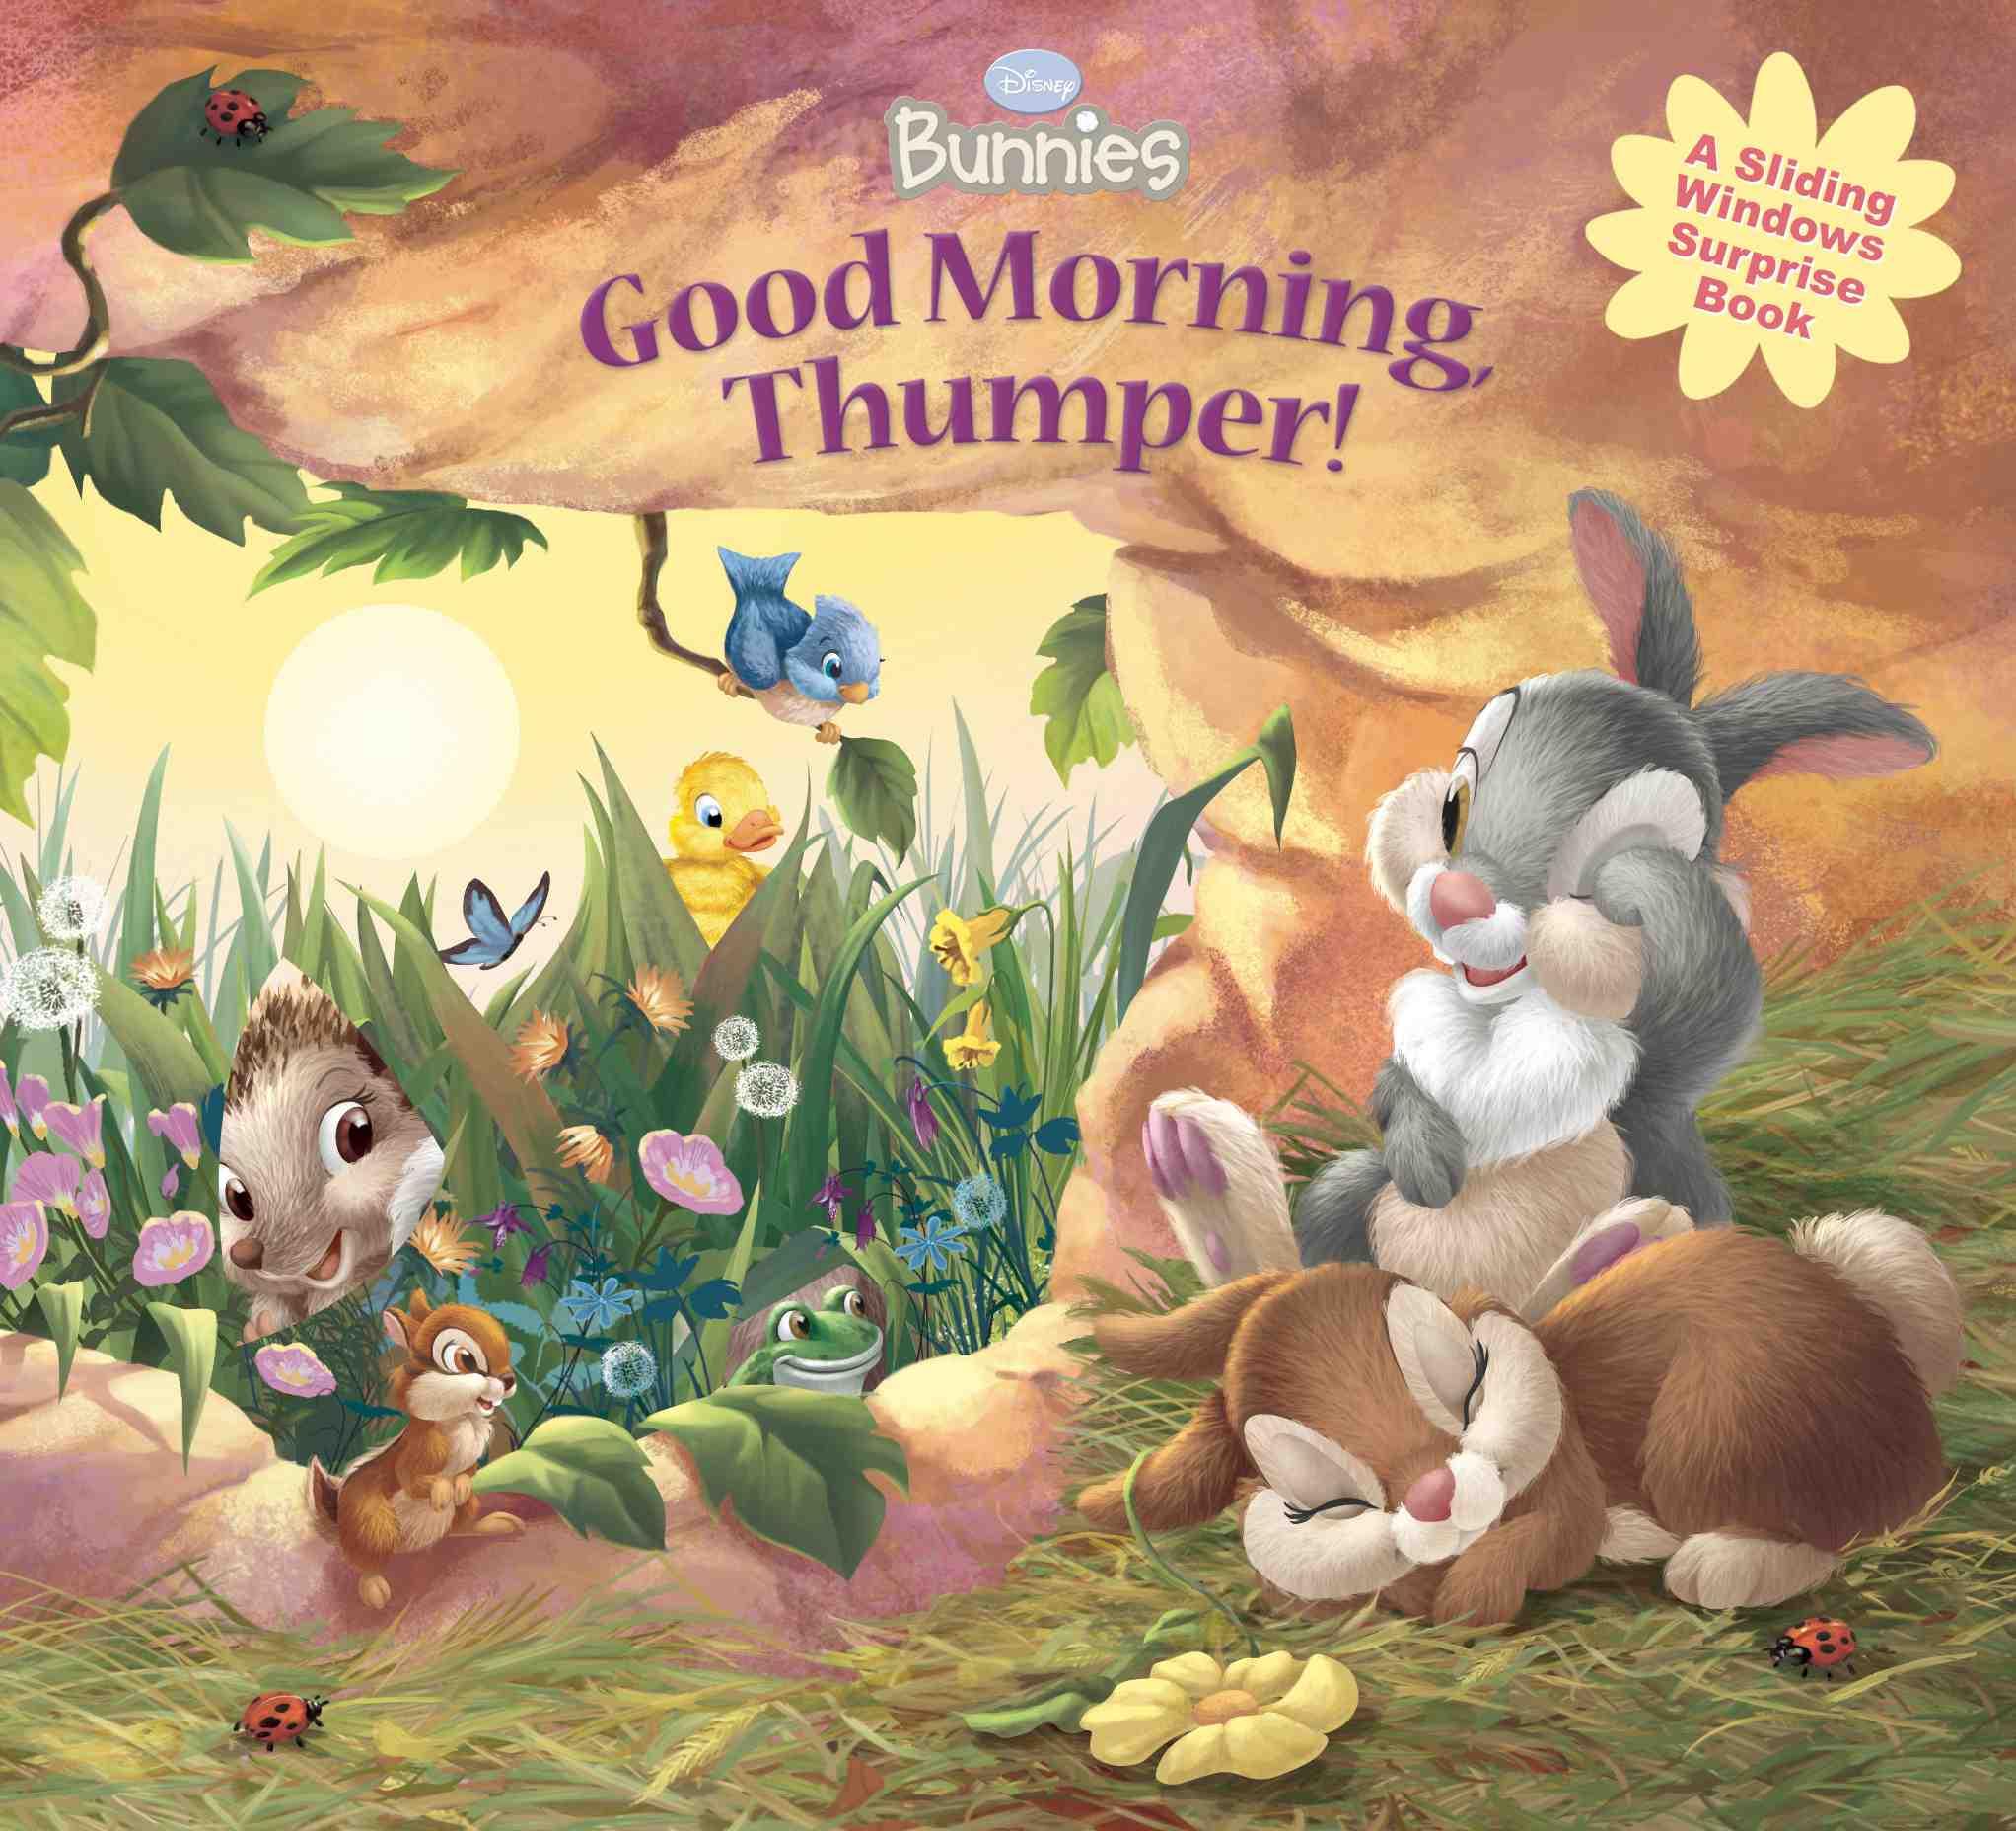 Good Morning, Thumper!